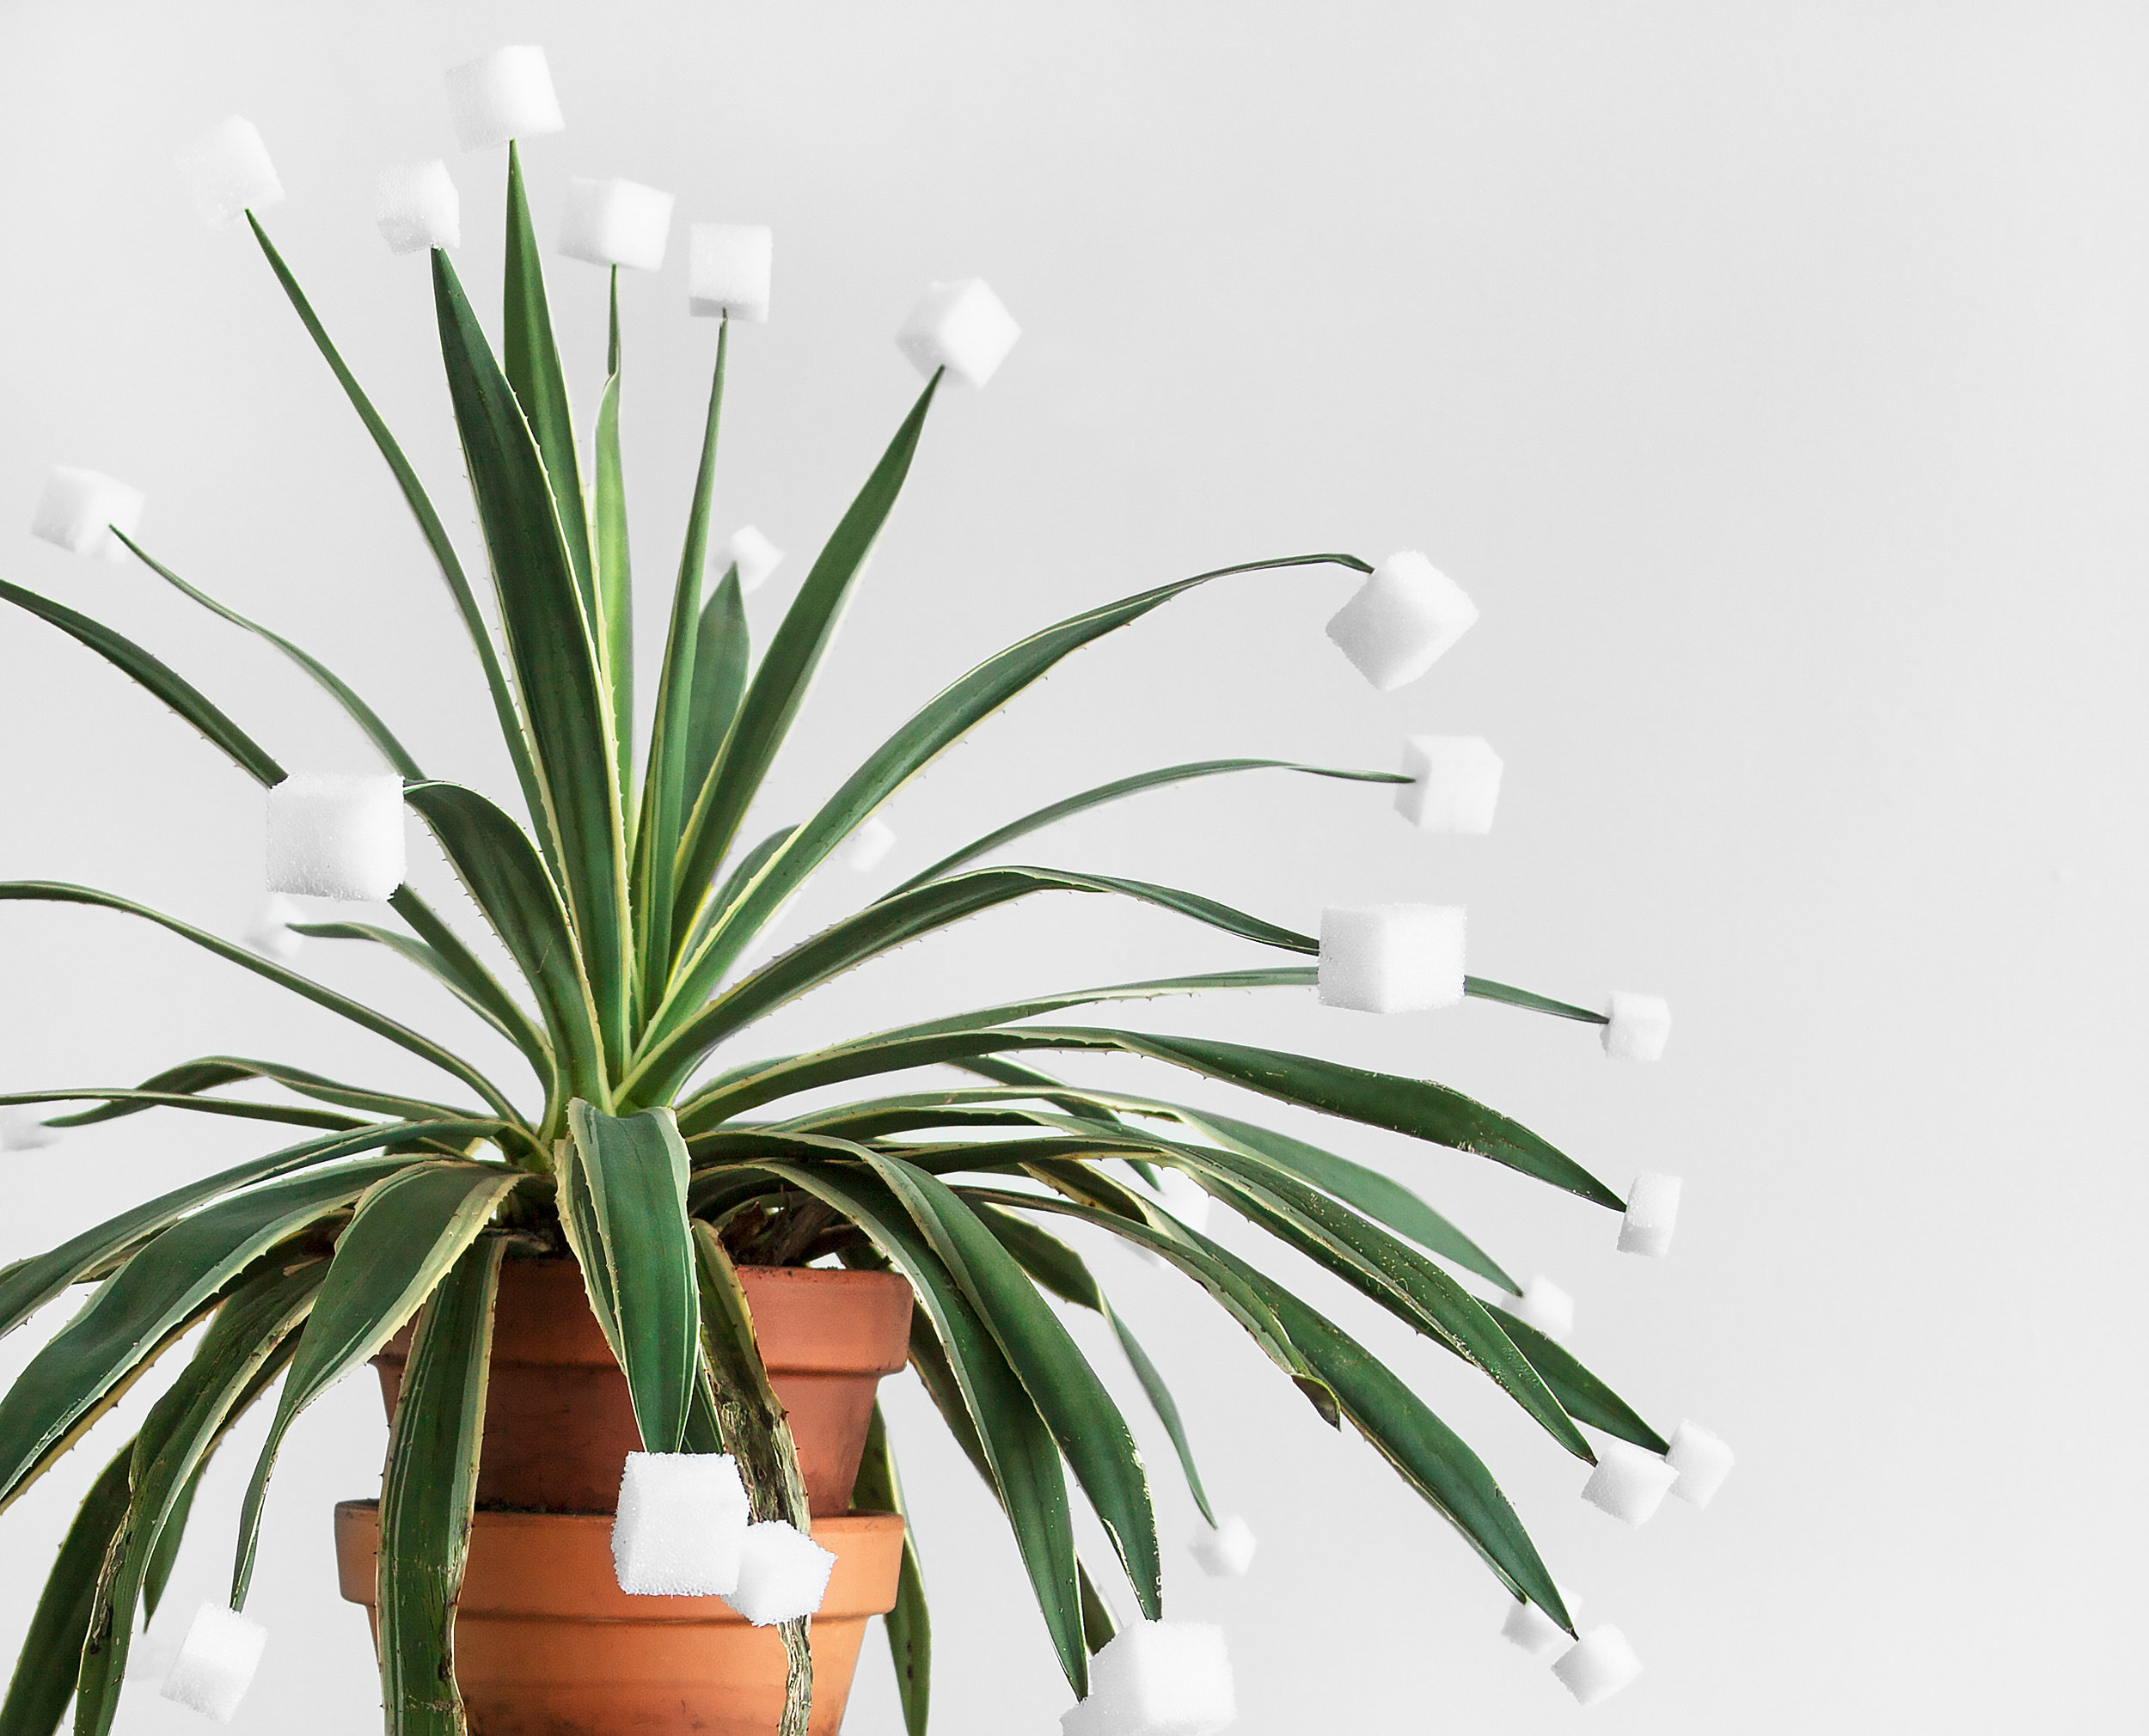 "Cube Tips (for Victoria) , detail, 2014, agave plant, soil, terra cotta pots, styrofoam, approx. 60""x 20""x 14""(152.4 cm x 50.8 cm x 35.6 cm)"